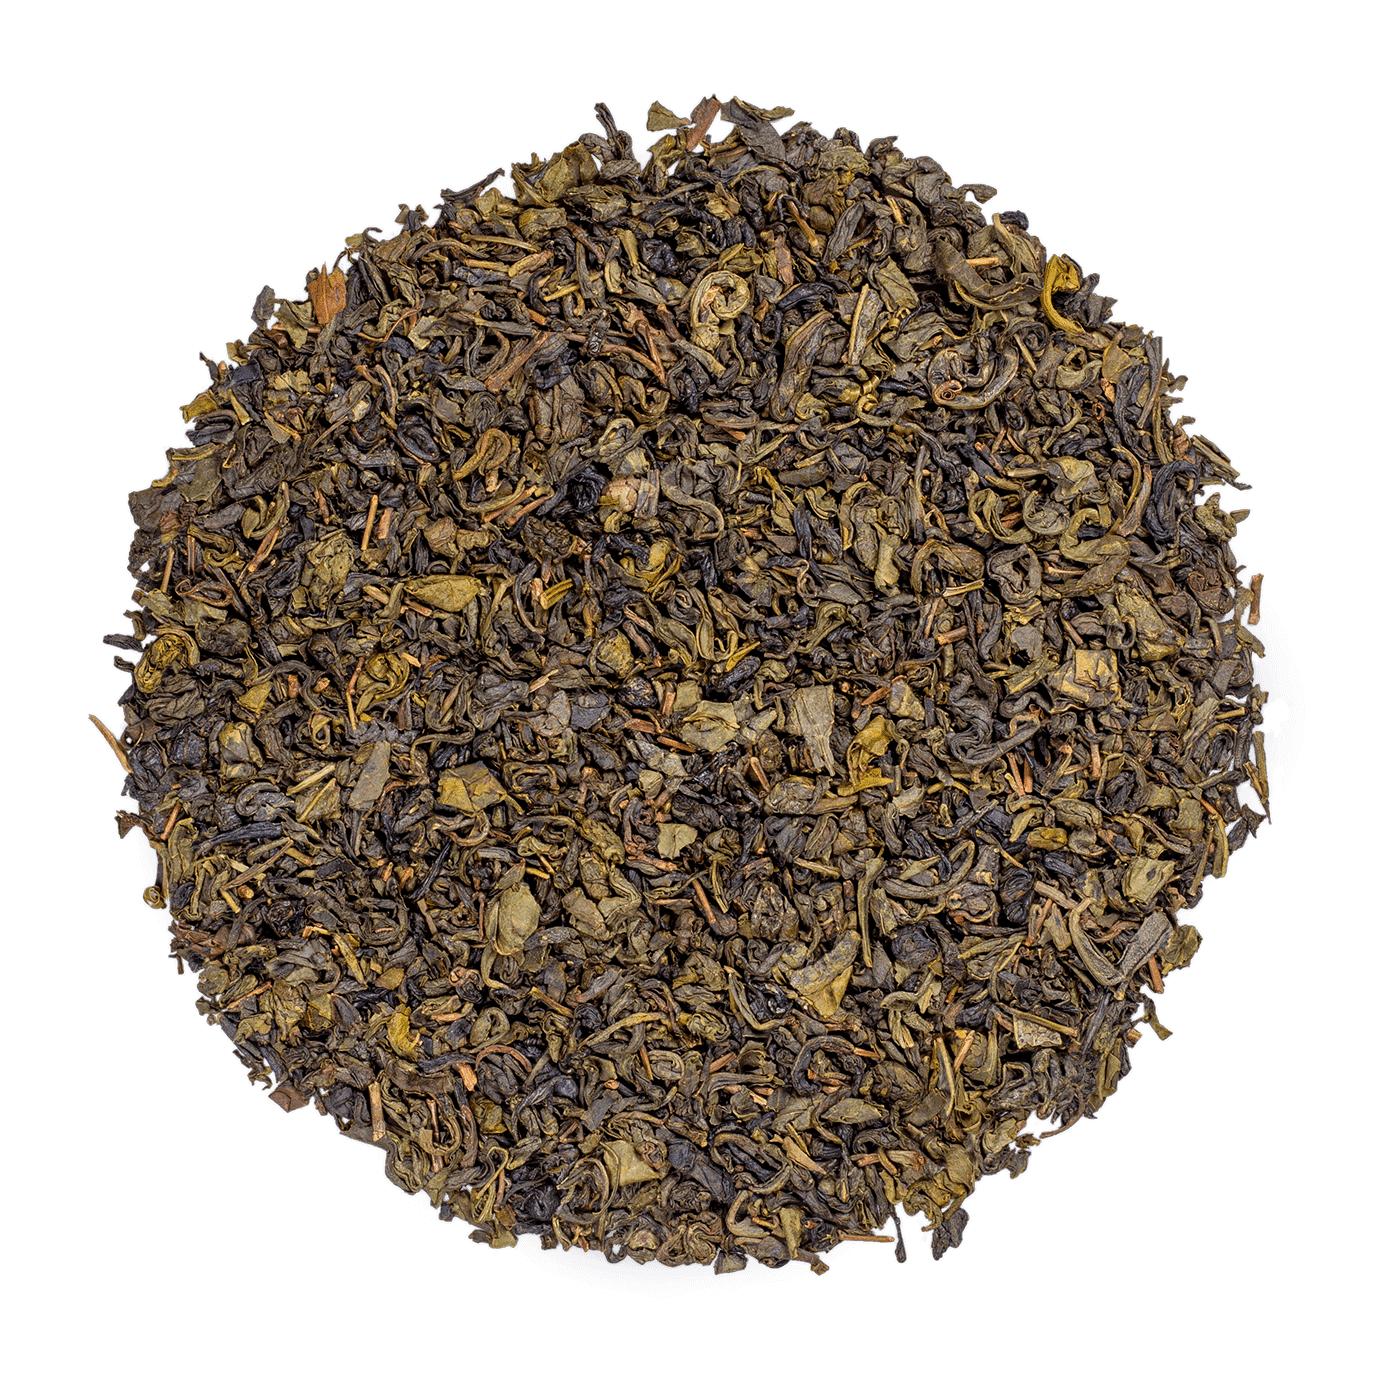 KUSMI TEA Vert Bouquet bio - Thé vert, bergamote, fleur - Thé en vrac - Kusmi Tea